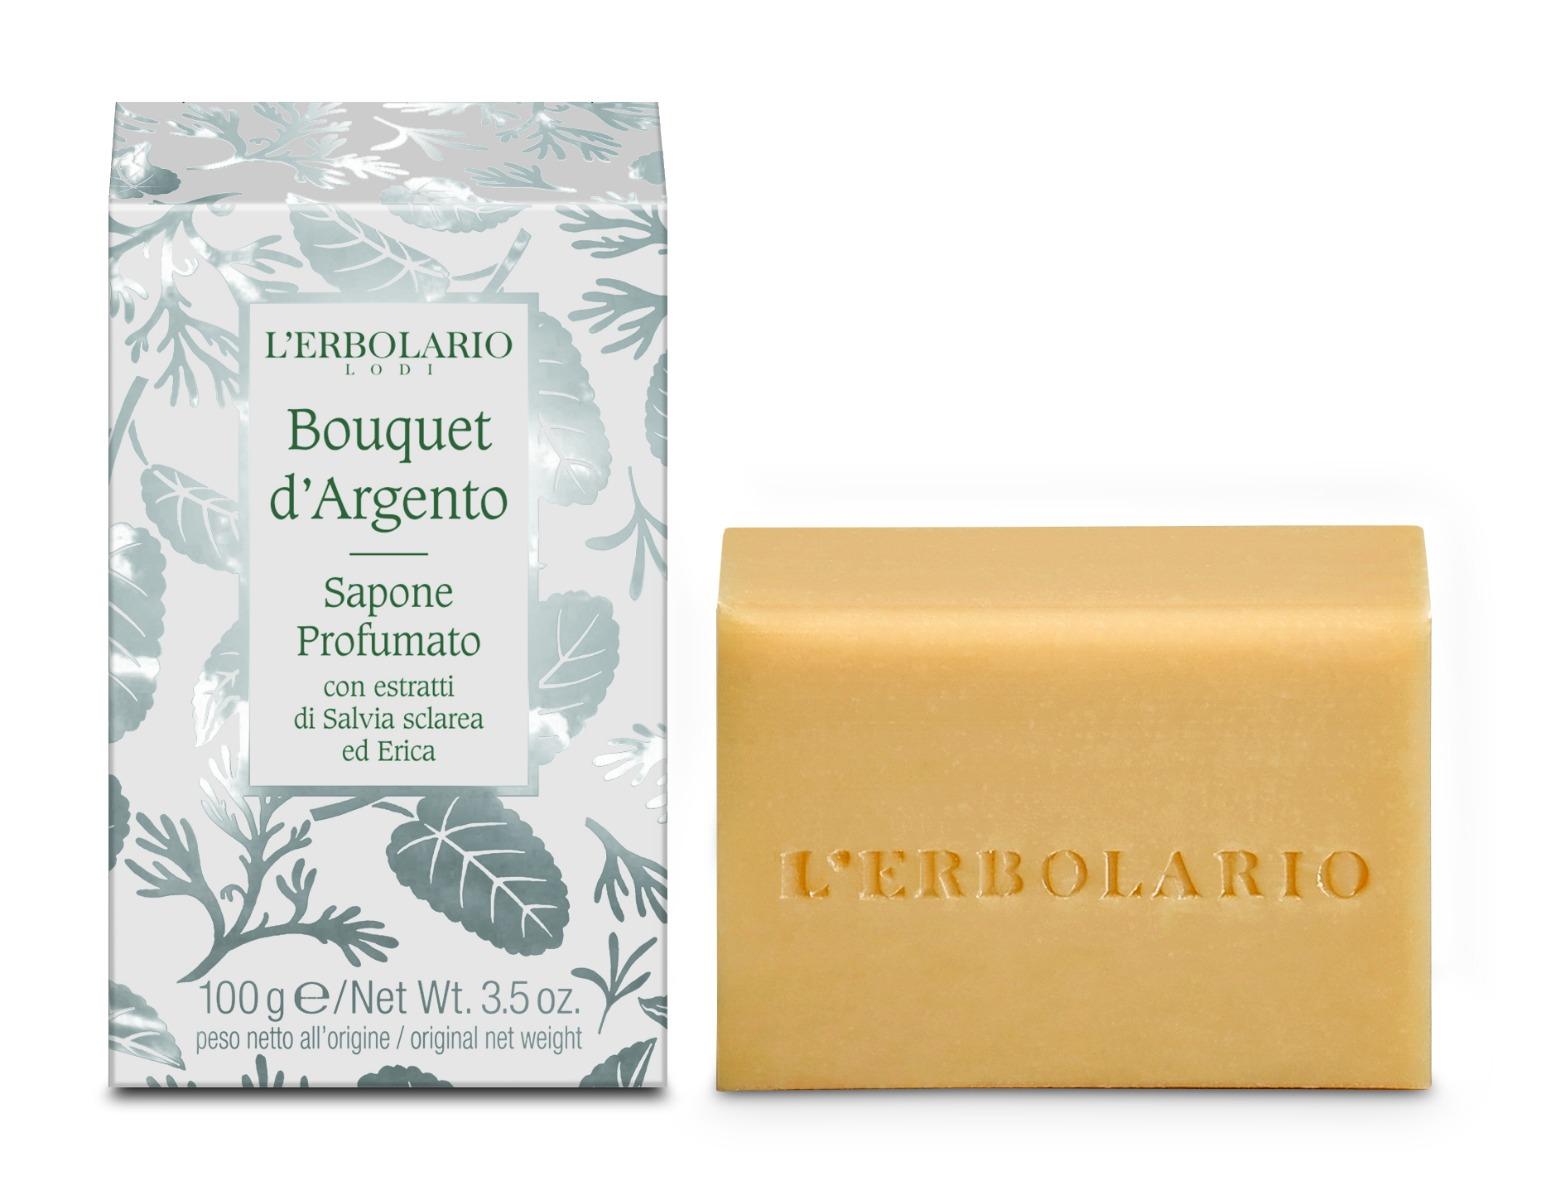 Sapun parfumat Silver Bouquet, 100g, L'Erbolario drmax poza